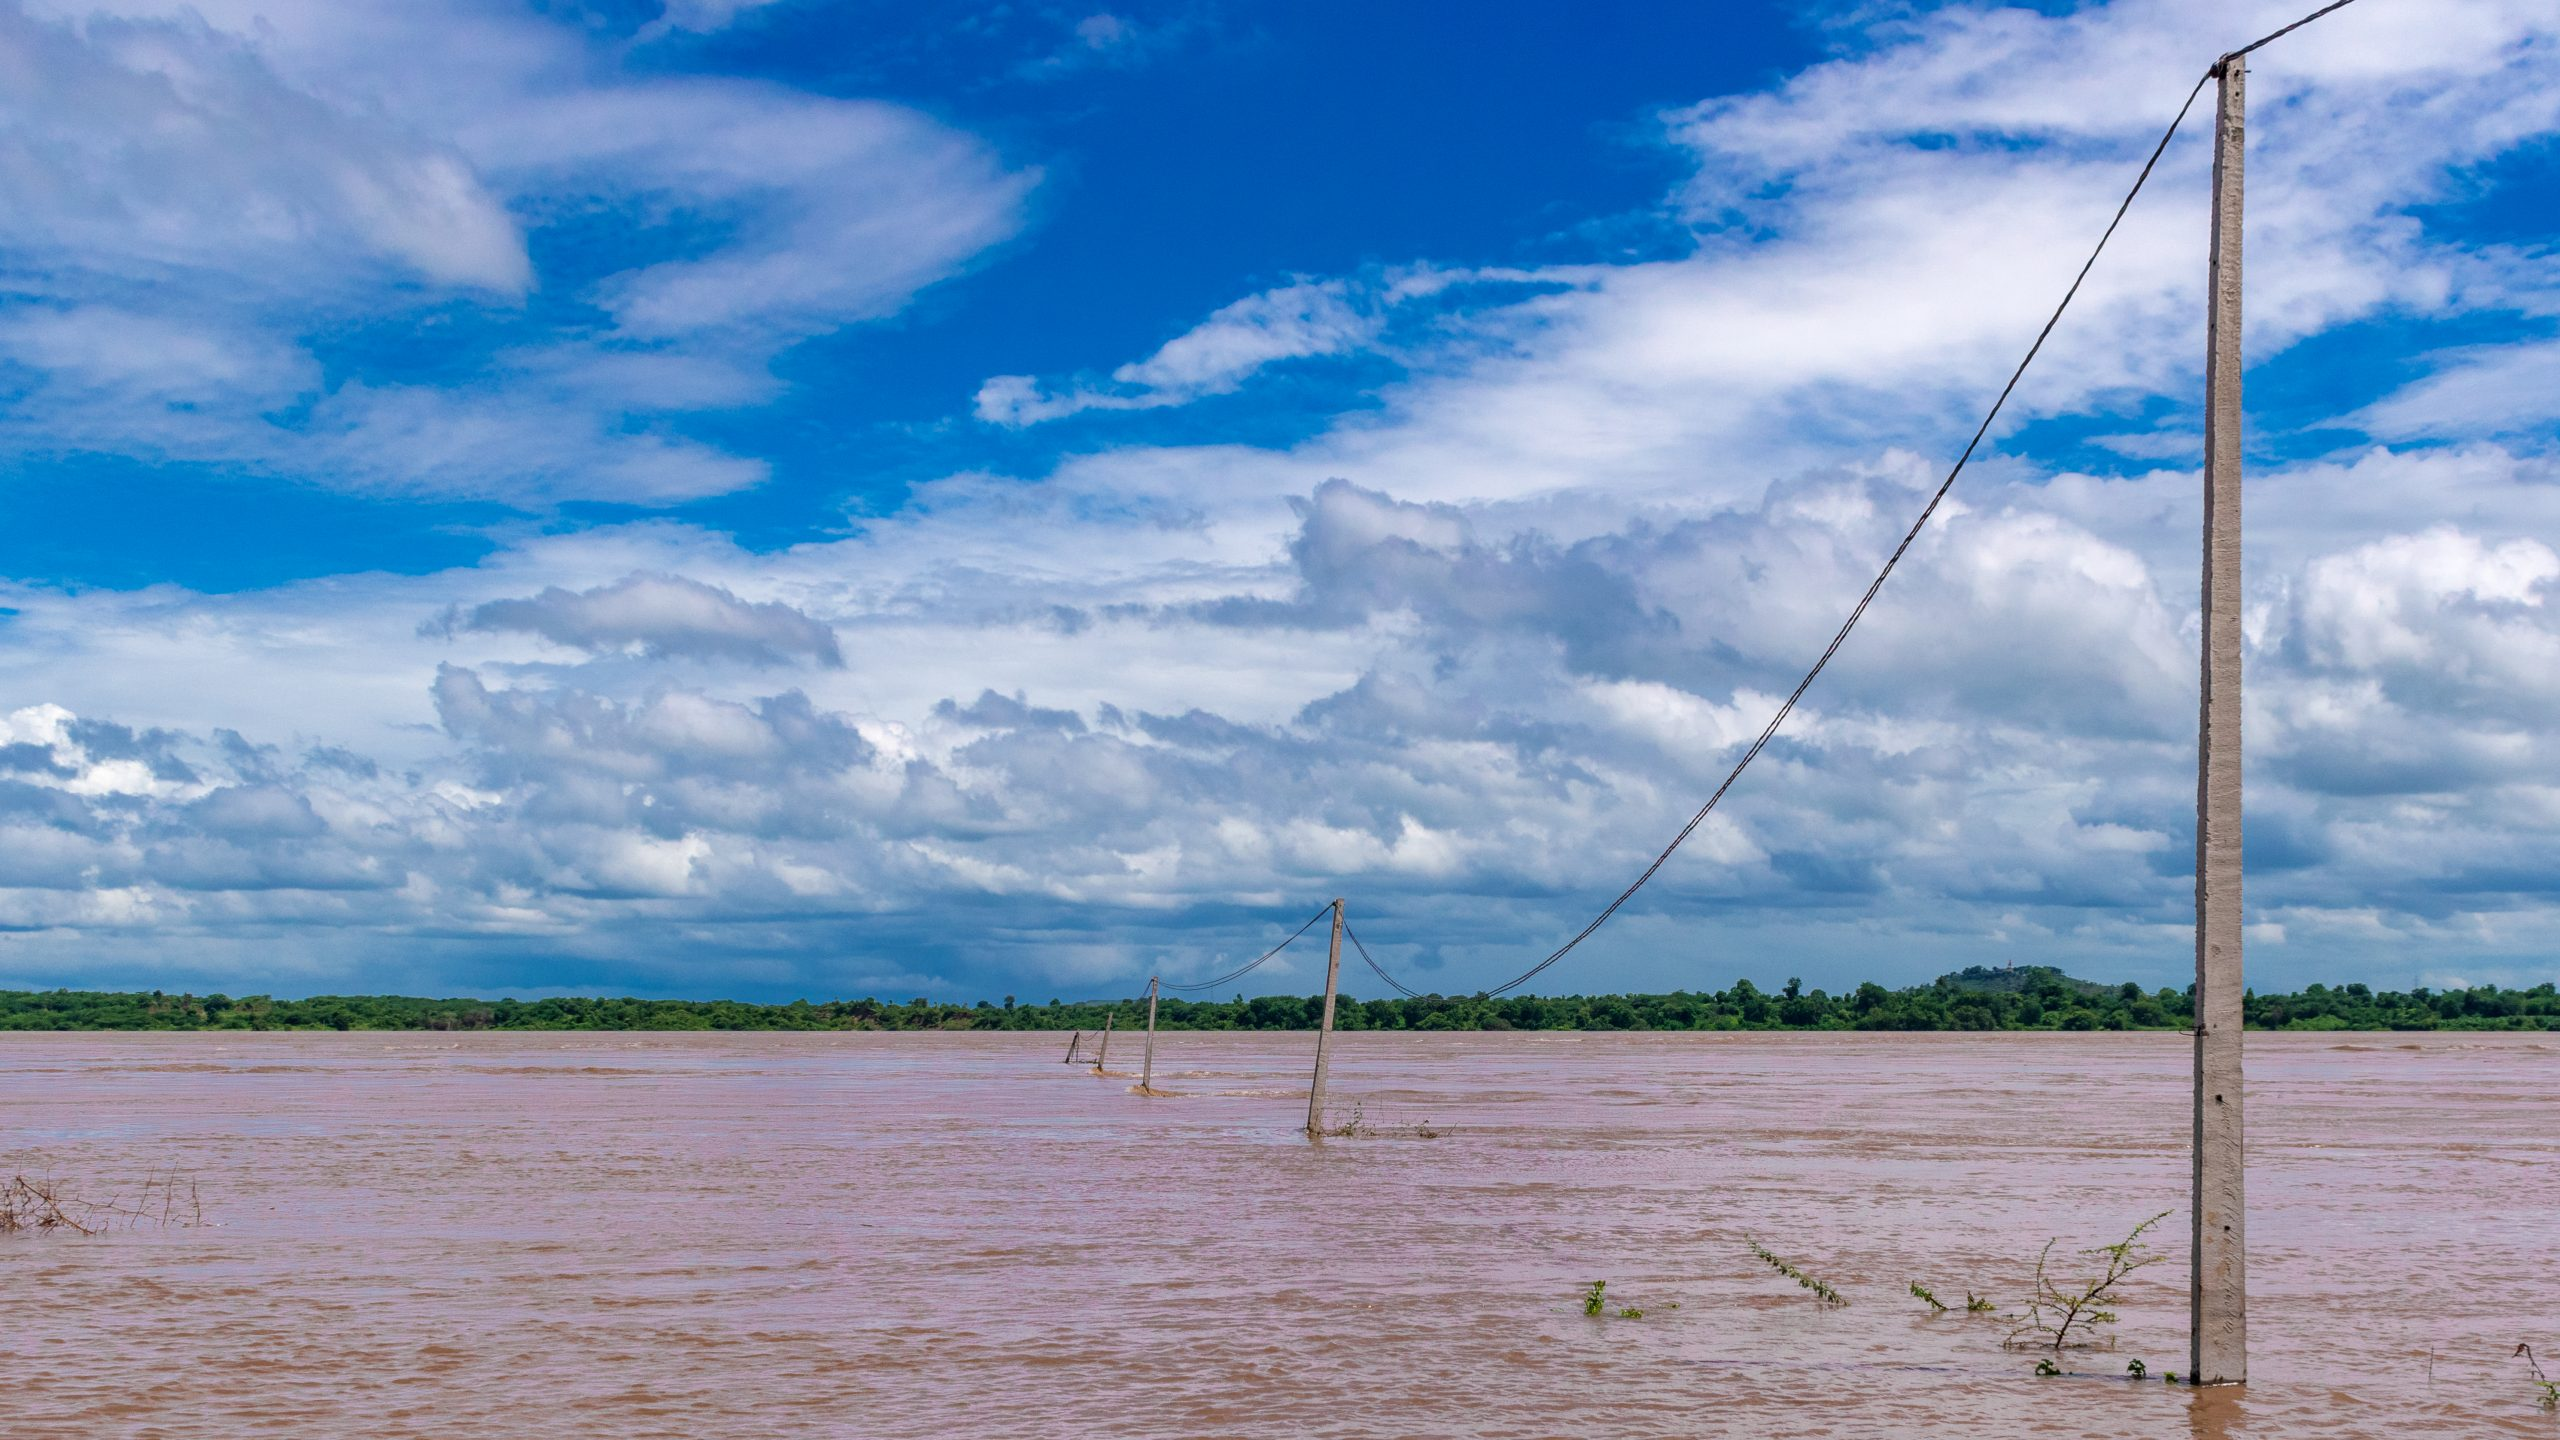 Overflow on Narmada river